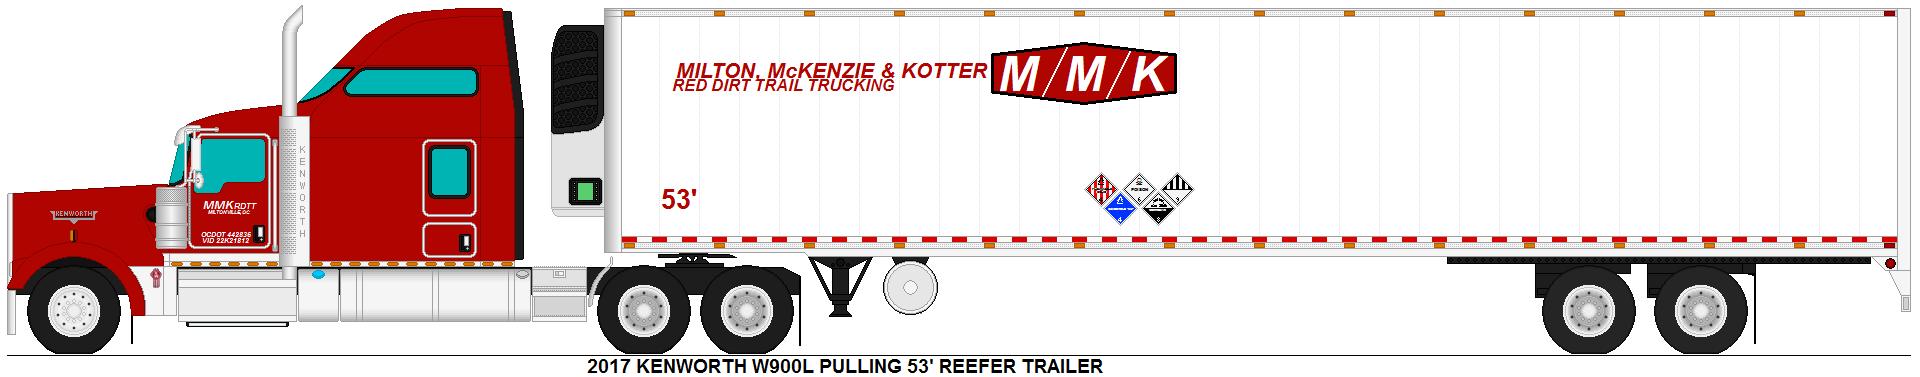 Kenworth W900L pulling reefer trailer by MisterPSYCHOPATH3001